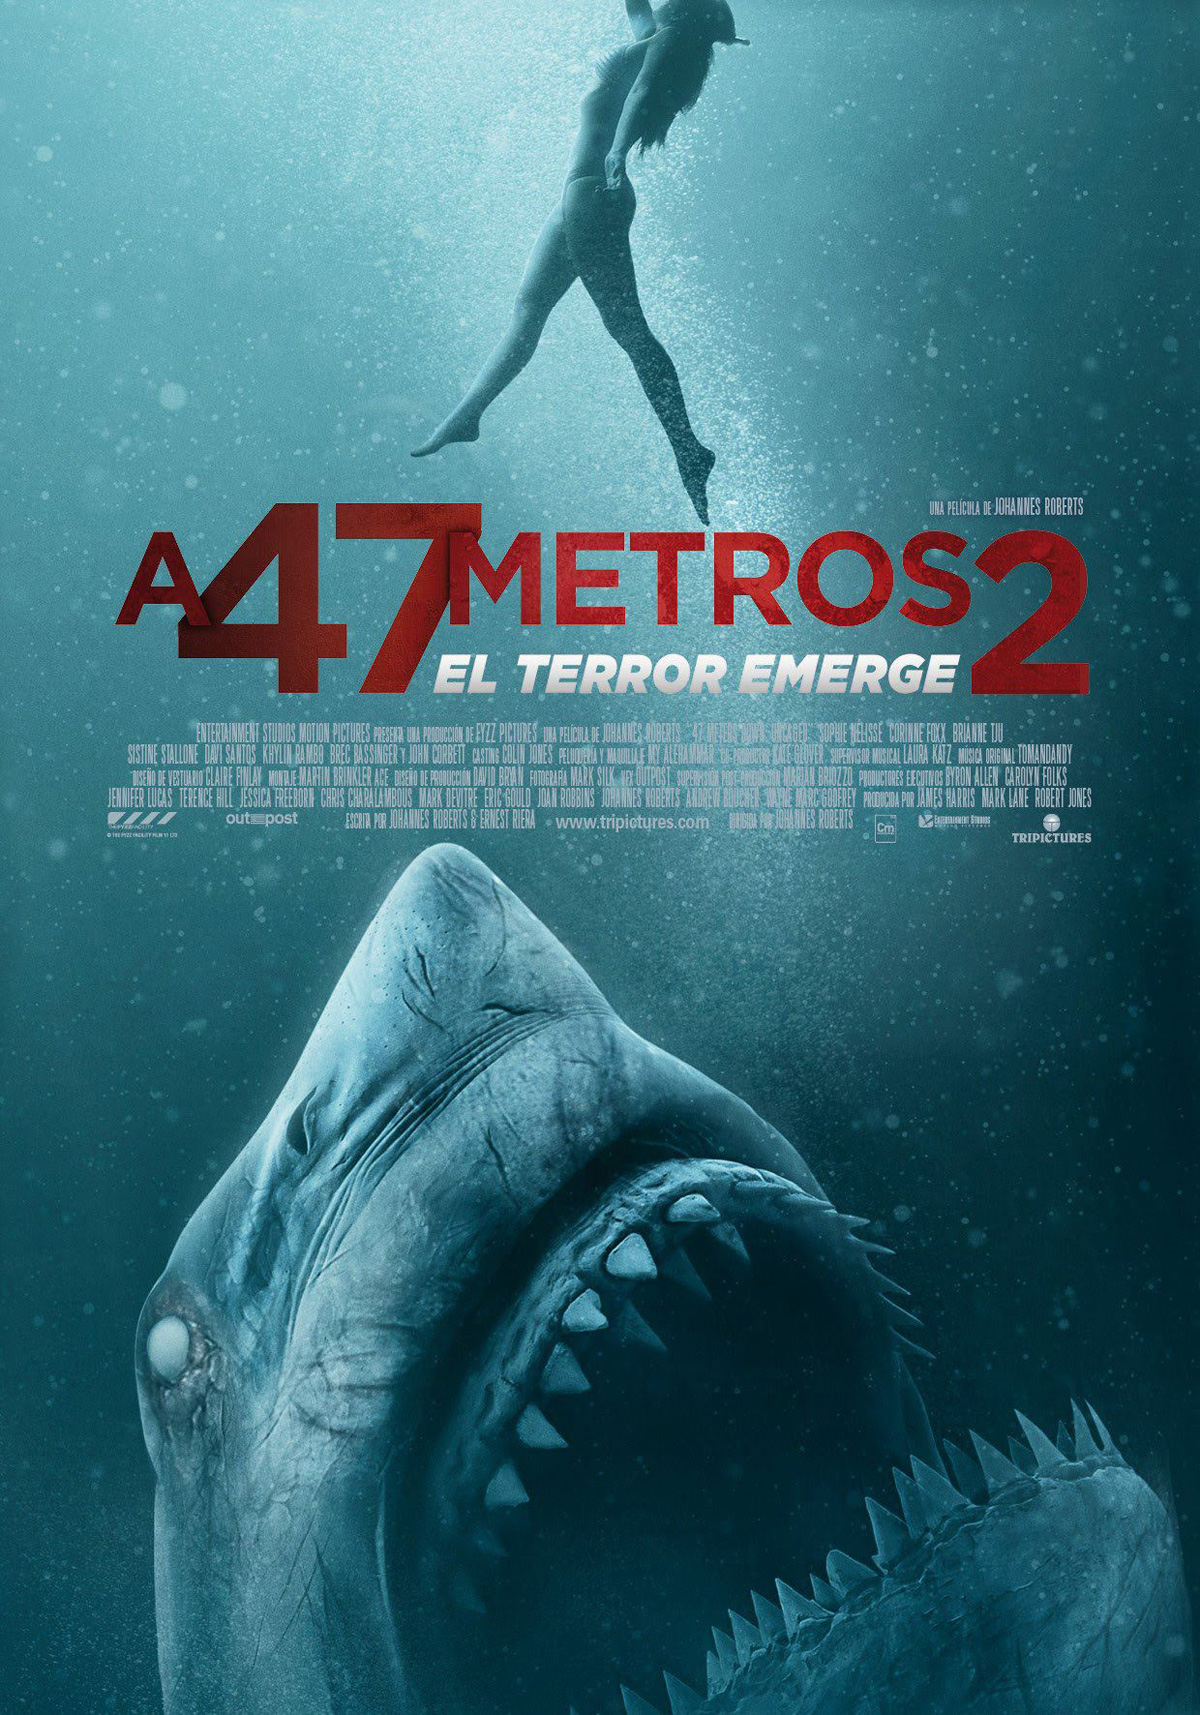 A 47 Metros 2 El Terror Emerge Película 2018 Sensacine Com